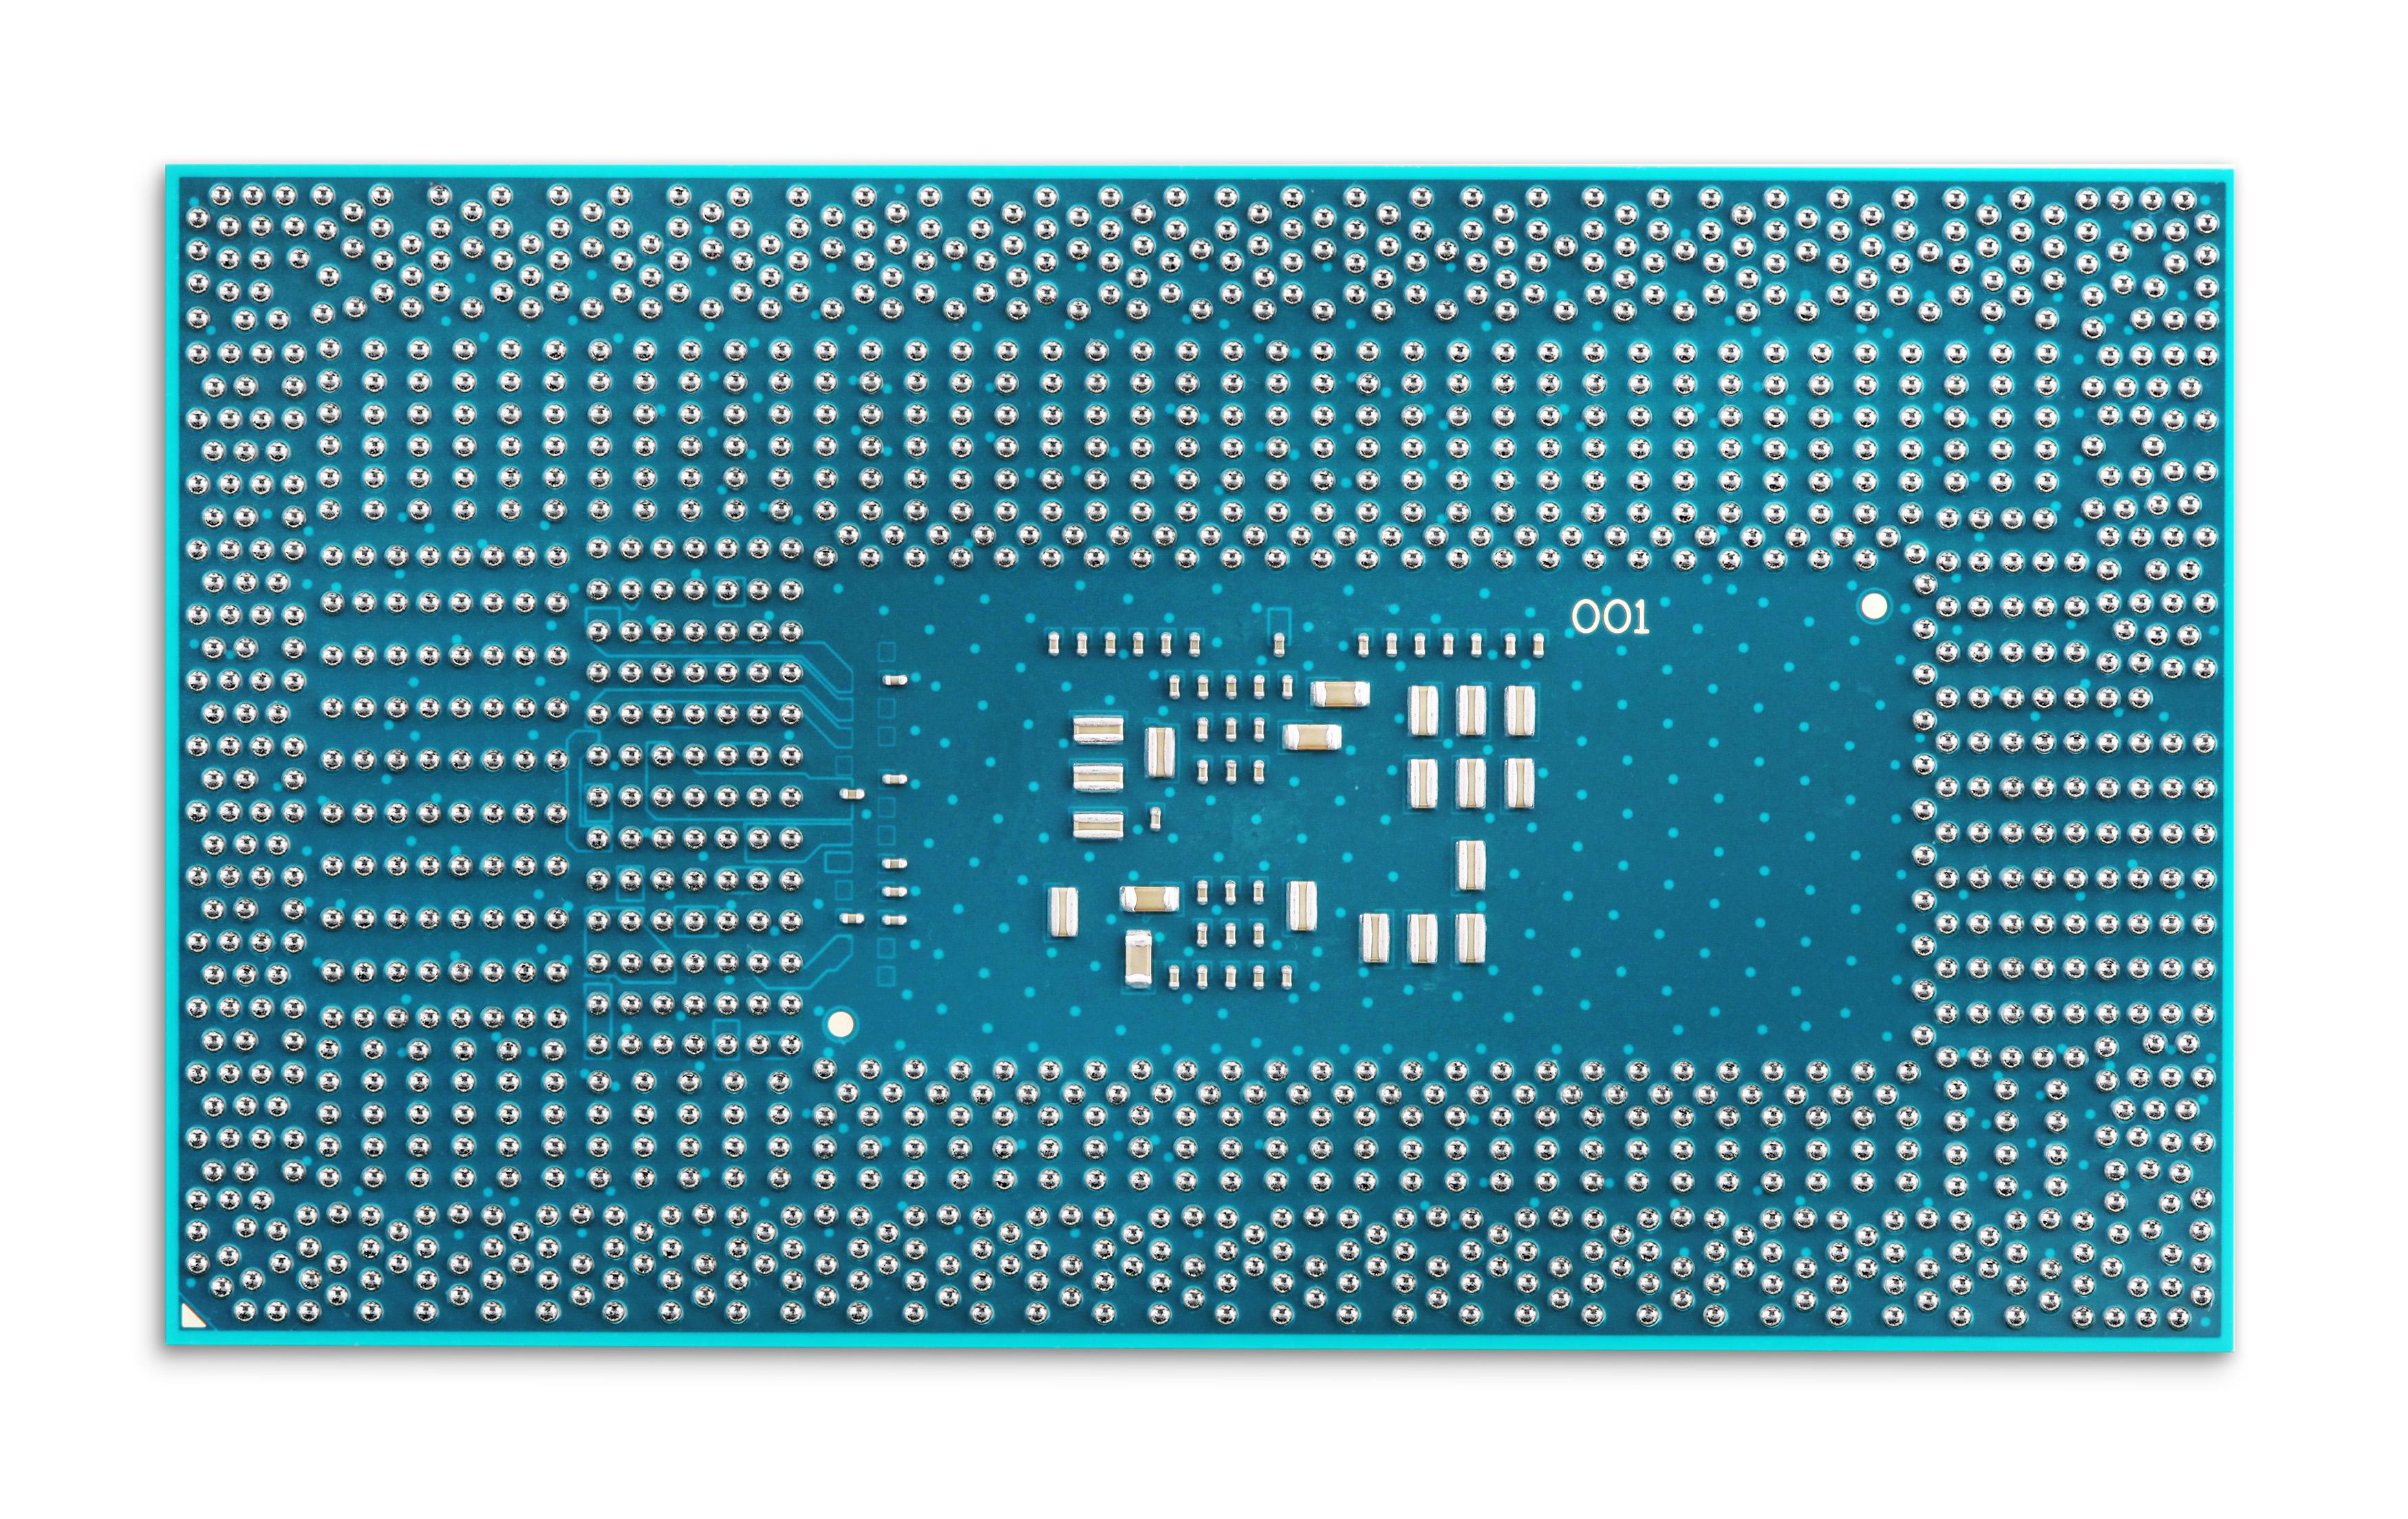 7th Gen Intel Core U-series back